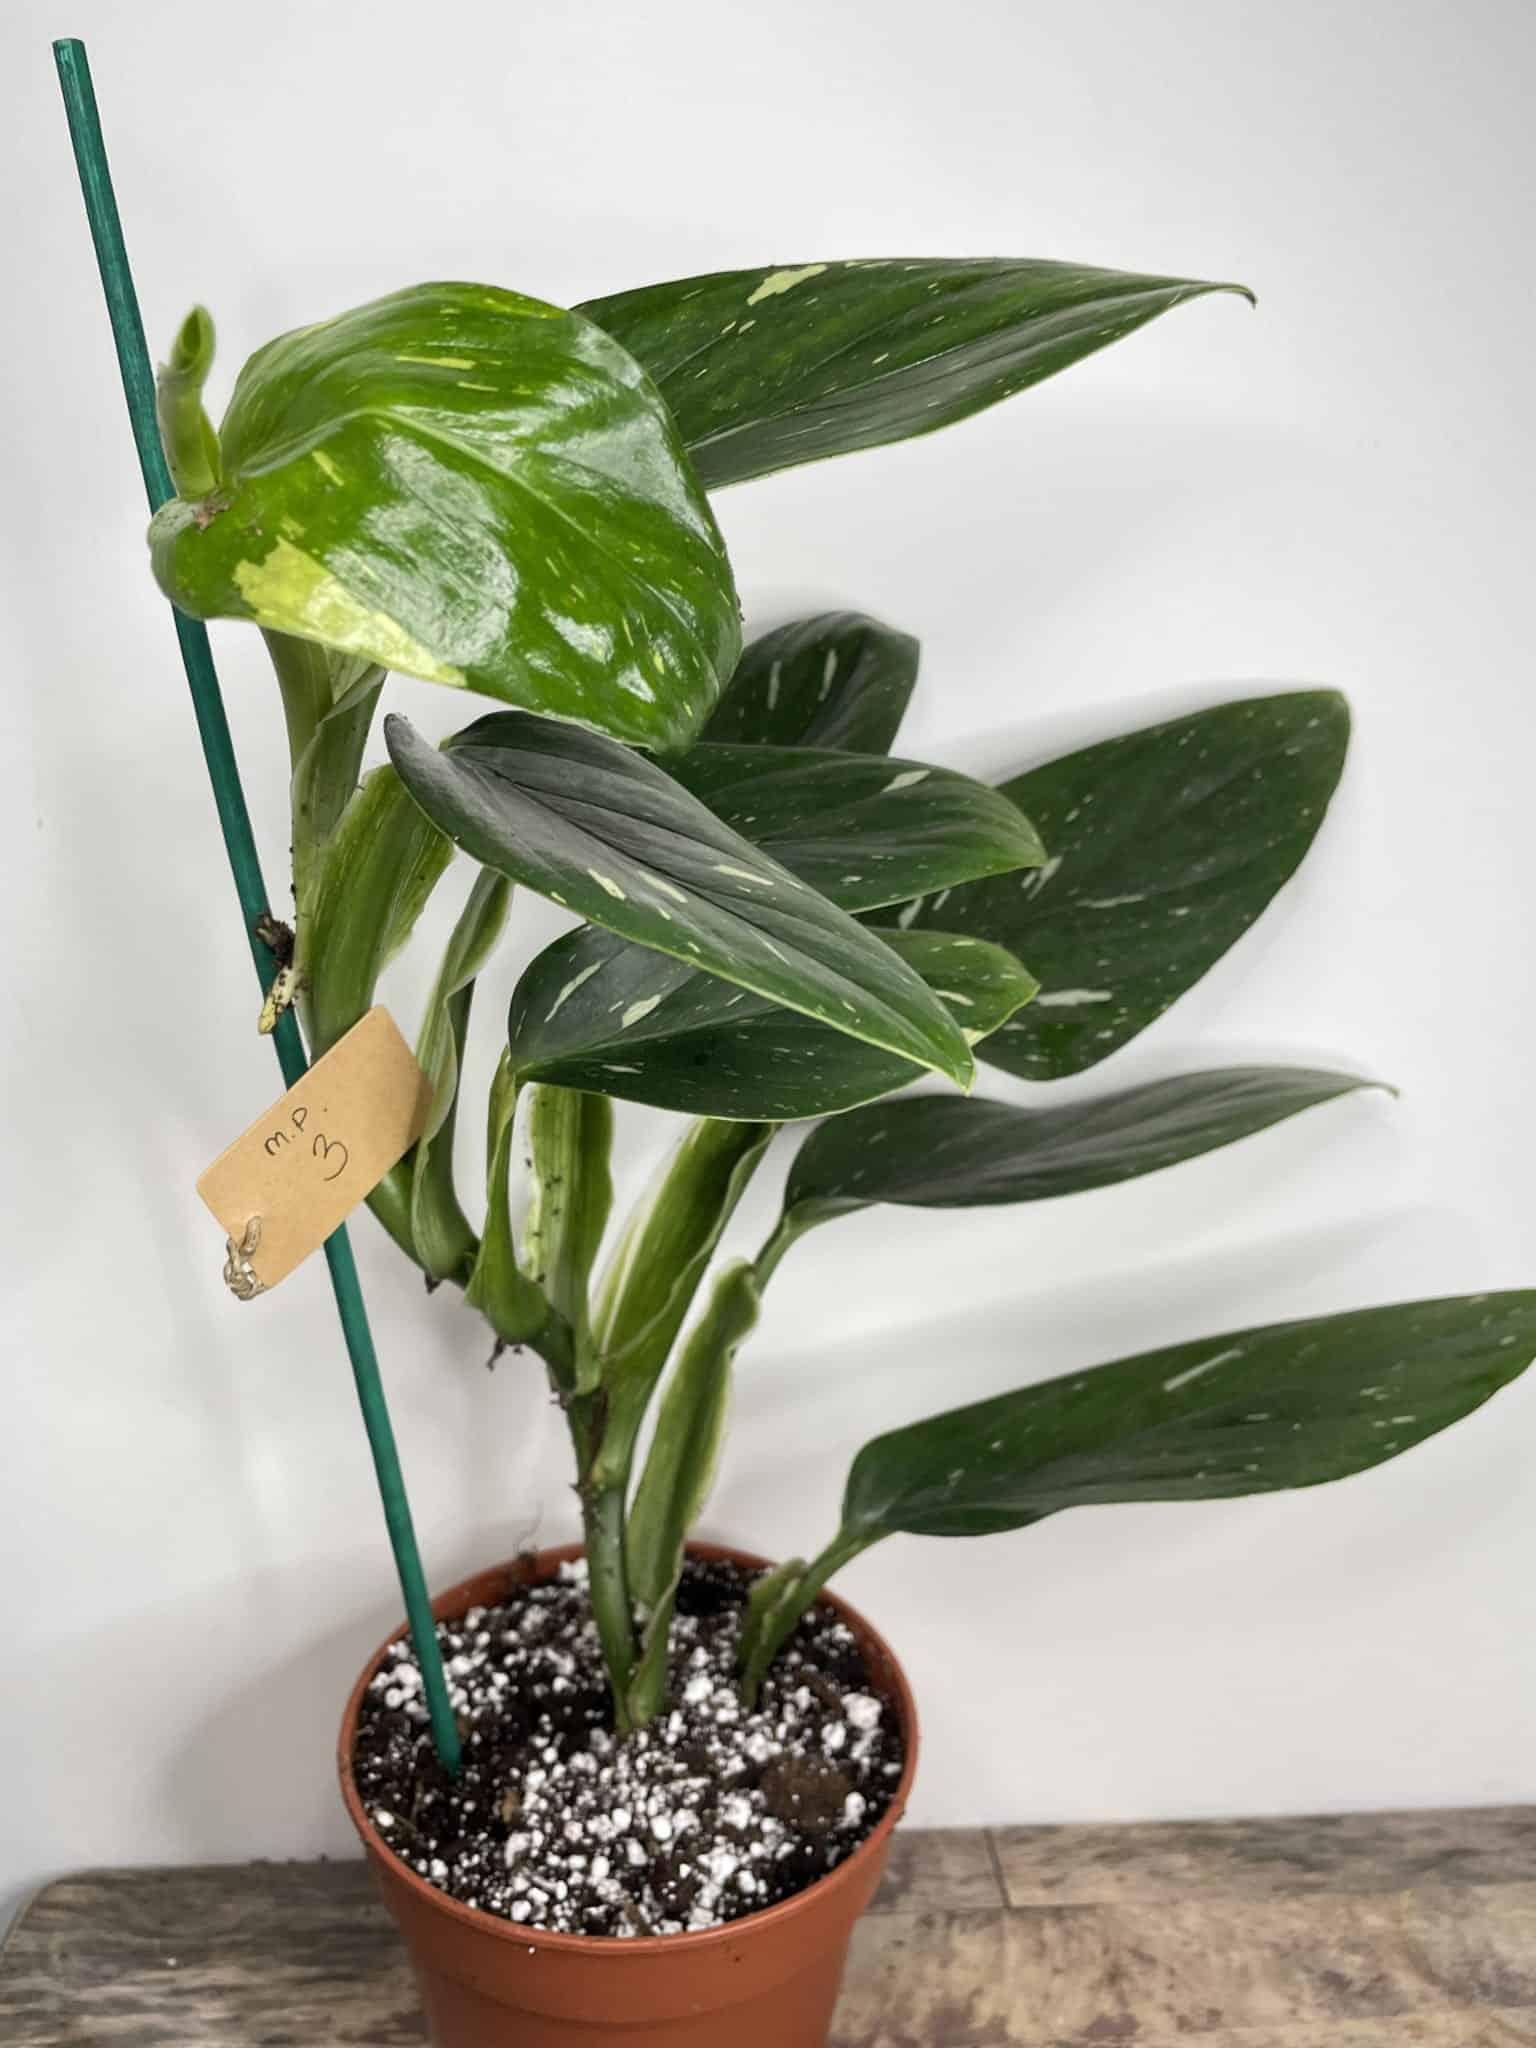 Philodendron Cobra in 13cm pot | Monstera standleyana